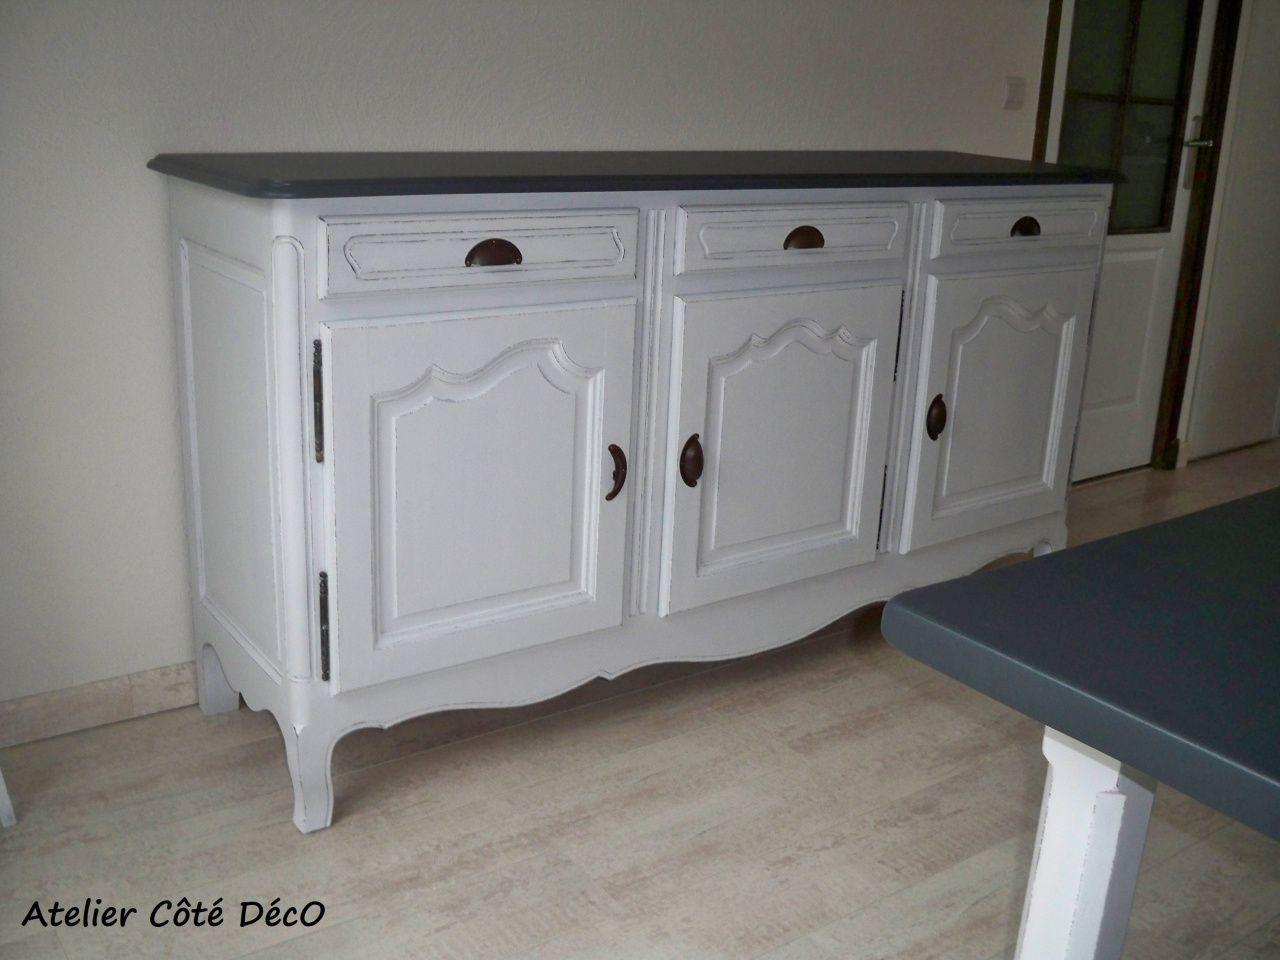 Relooker Meuble Ancien En Moderne relooker meuble ancien en moderne – relooker meuble ancien